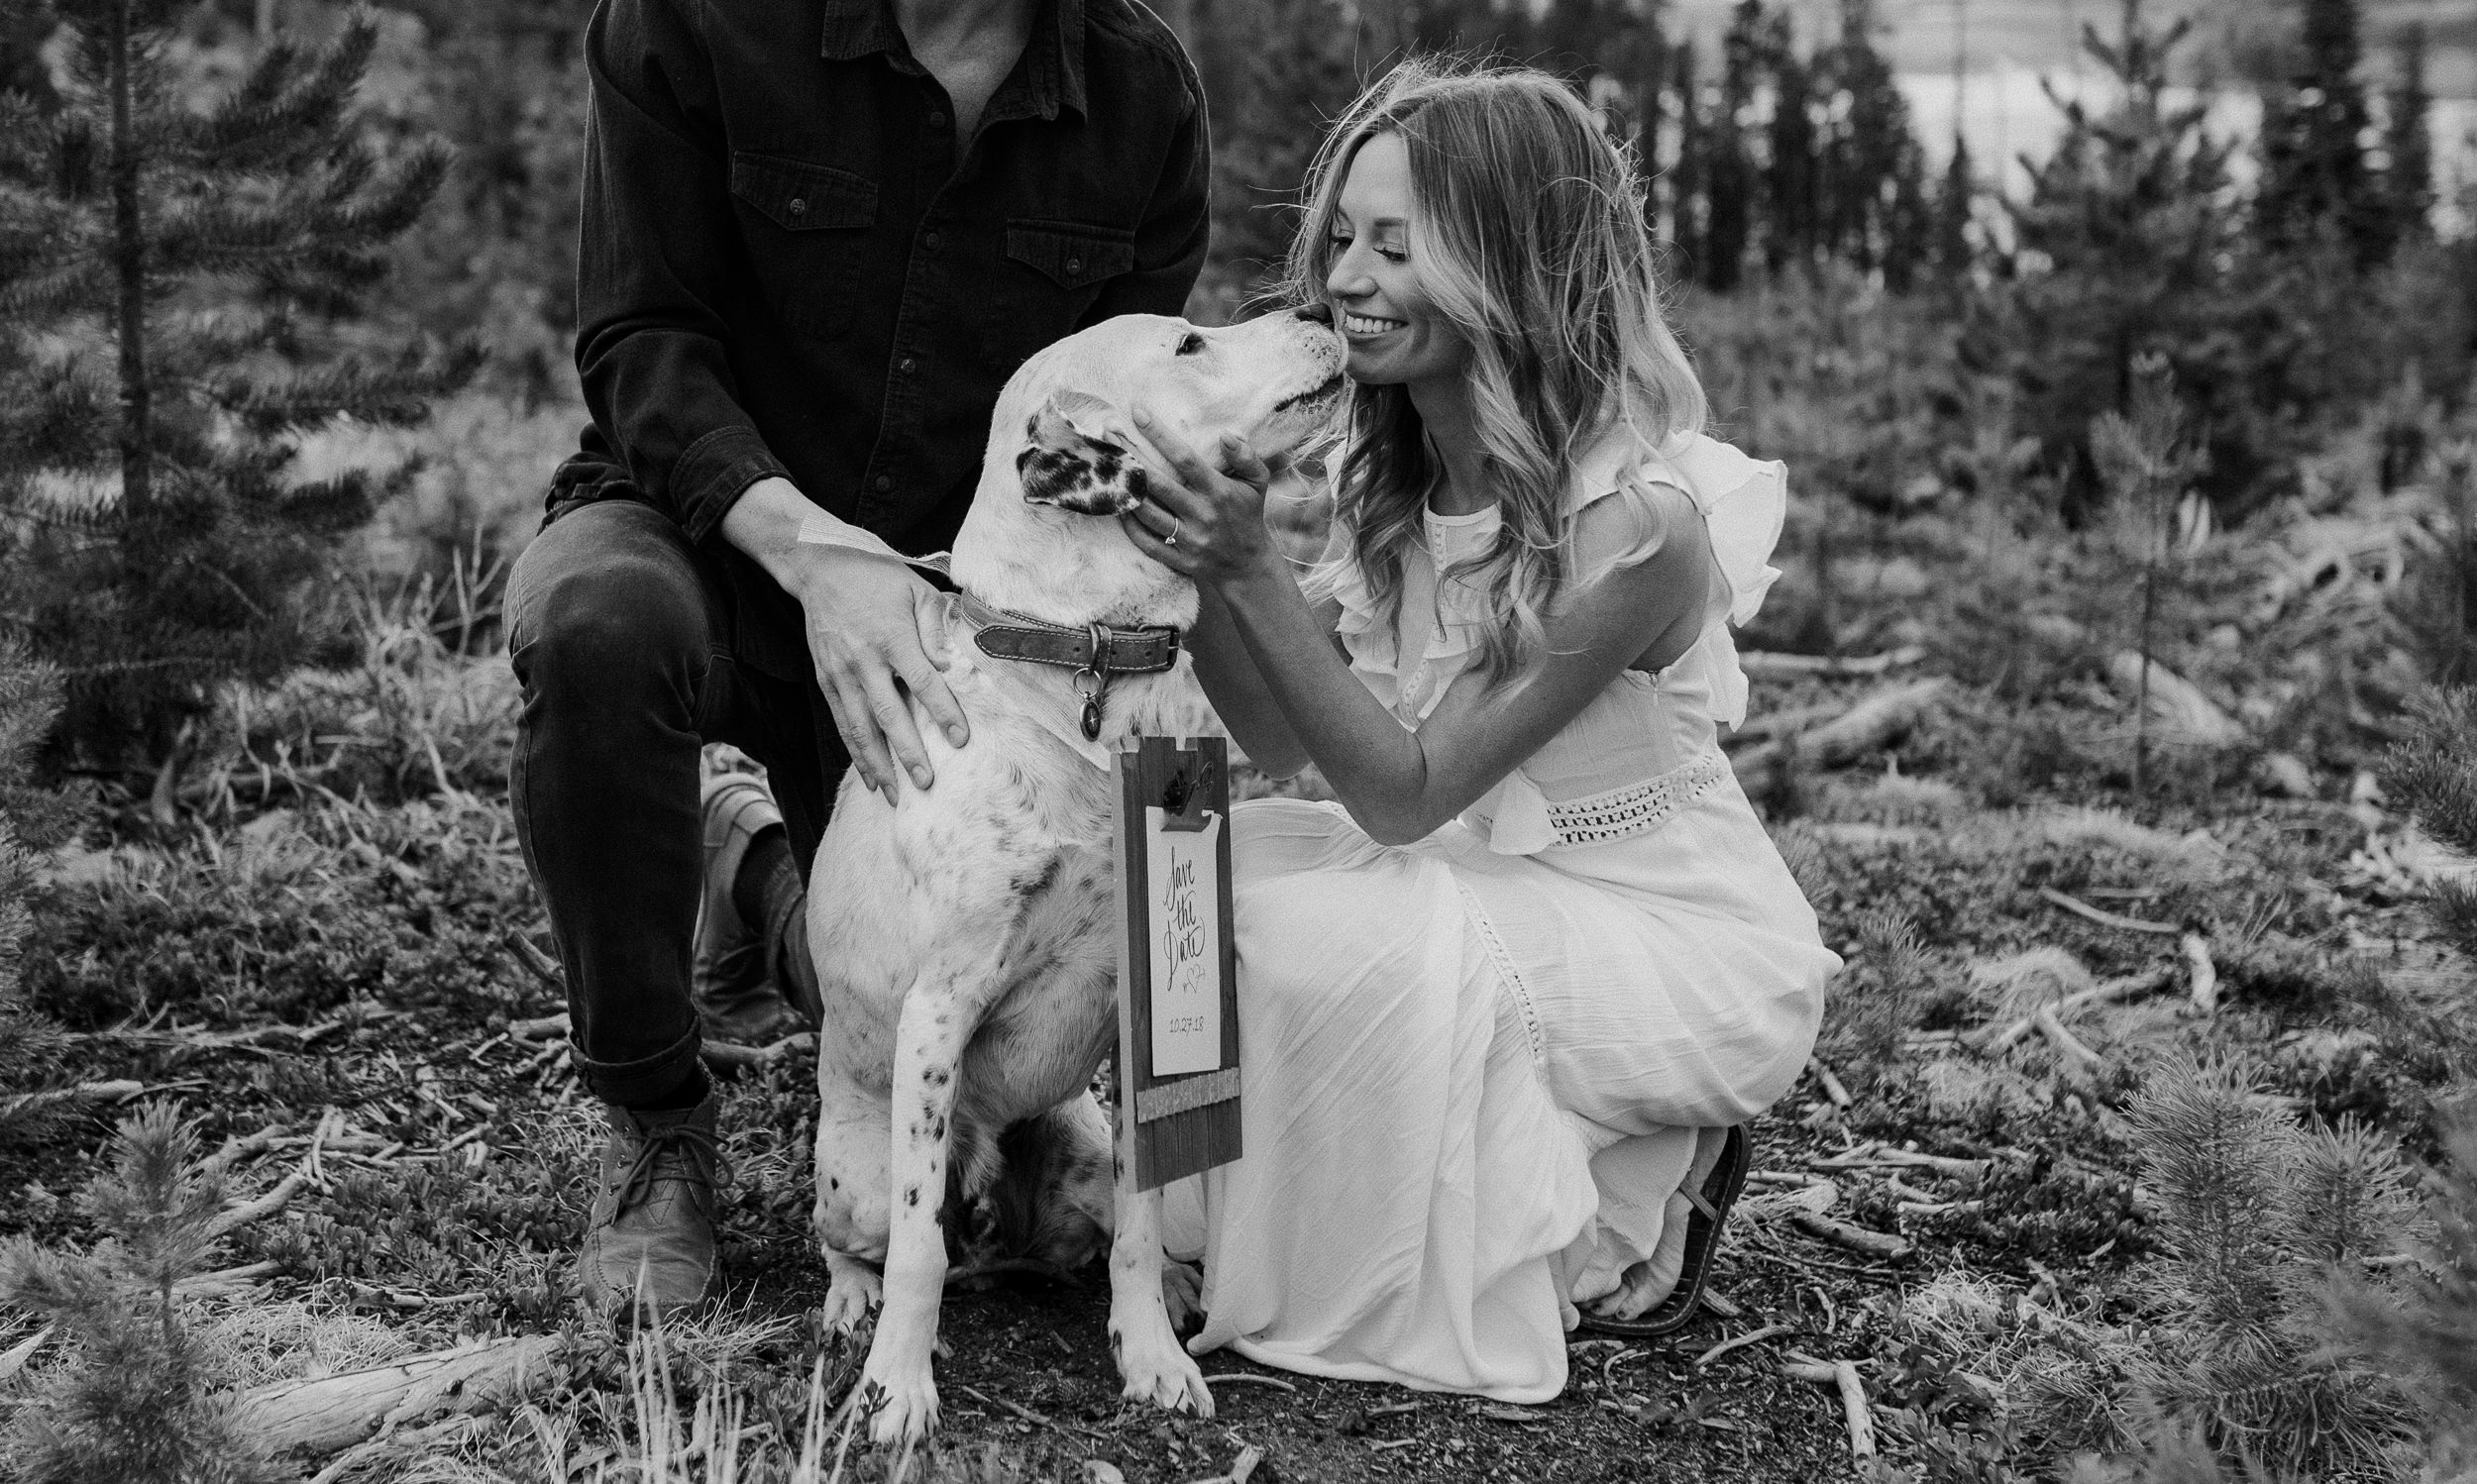 Breckenridge, Colorado engagement session at Sapphire Point. Breckenridge elopement and wedding photographer